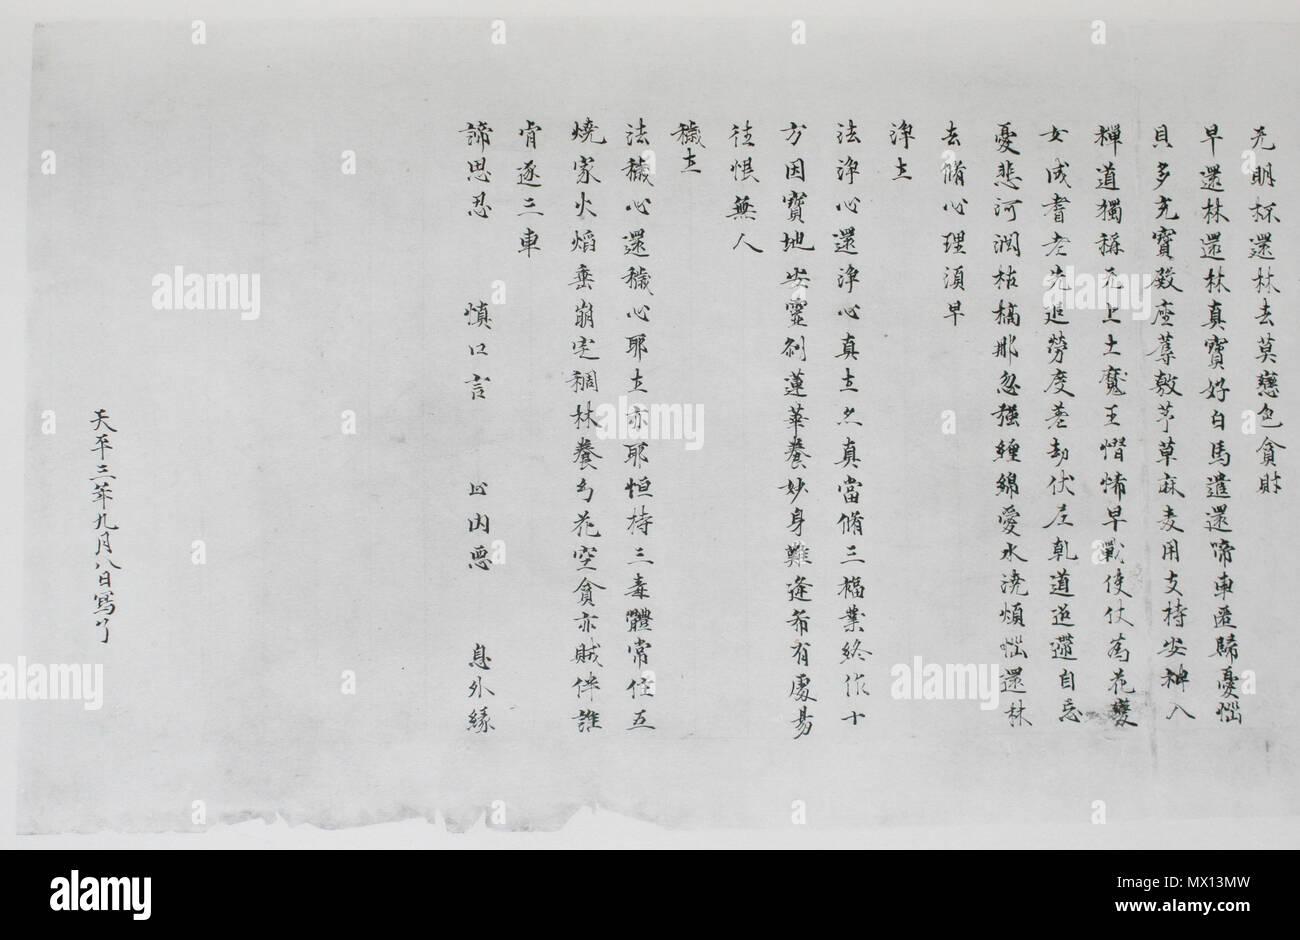 inglés el emperador shomu zasshu última parte pergaminos tinta